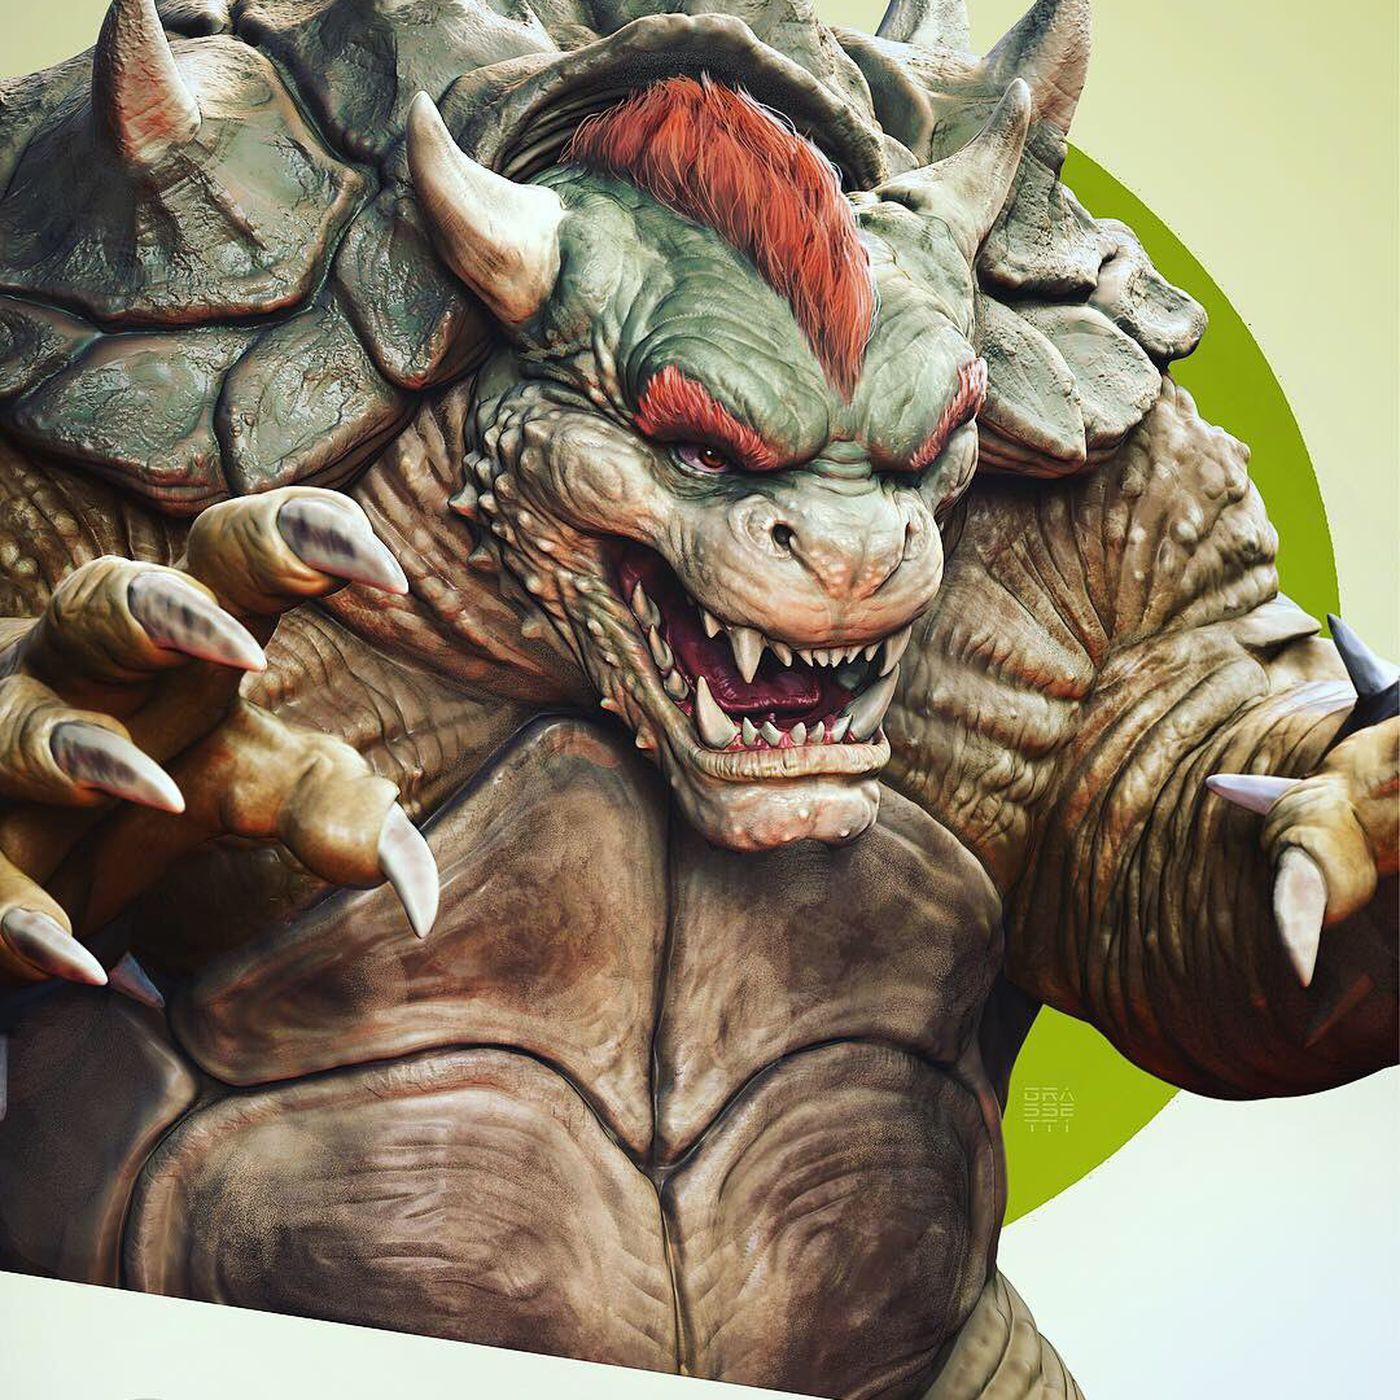 God of War artist's Super Smash Bros  fan art is beautiful and